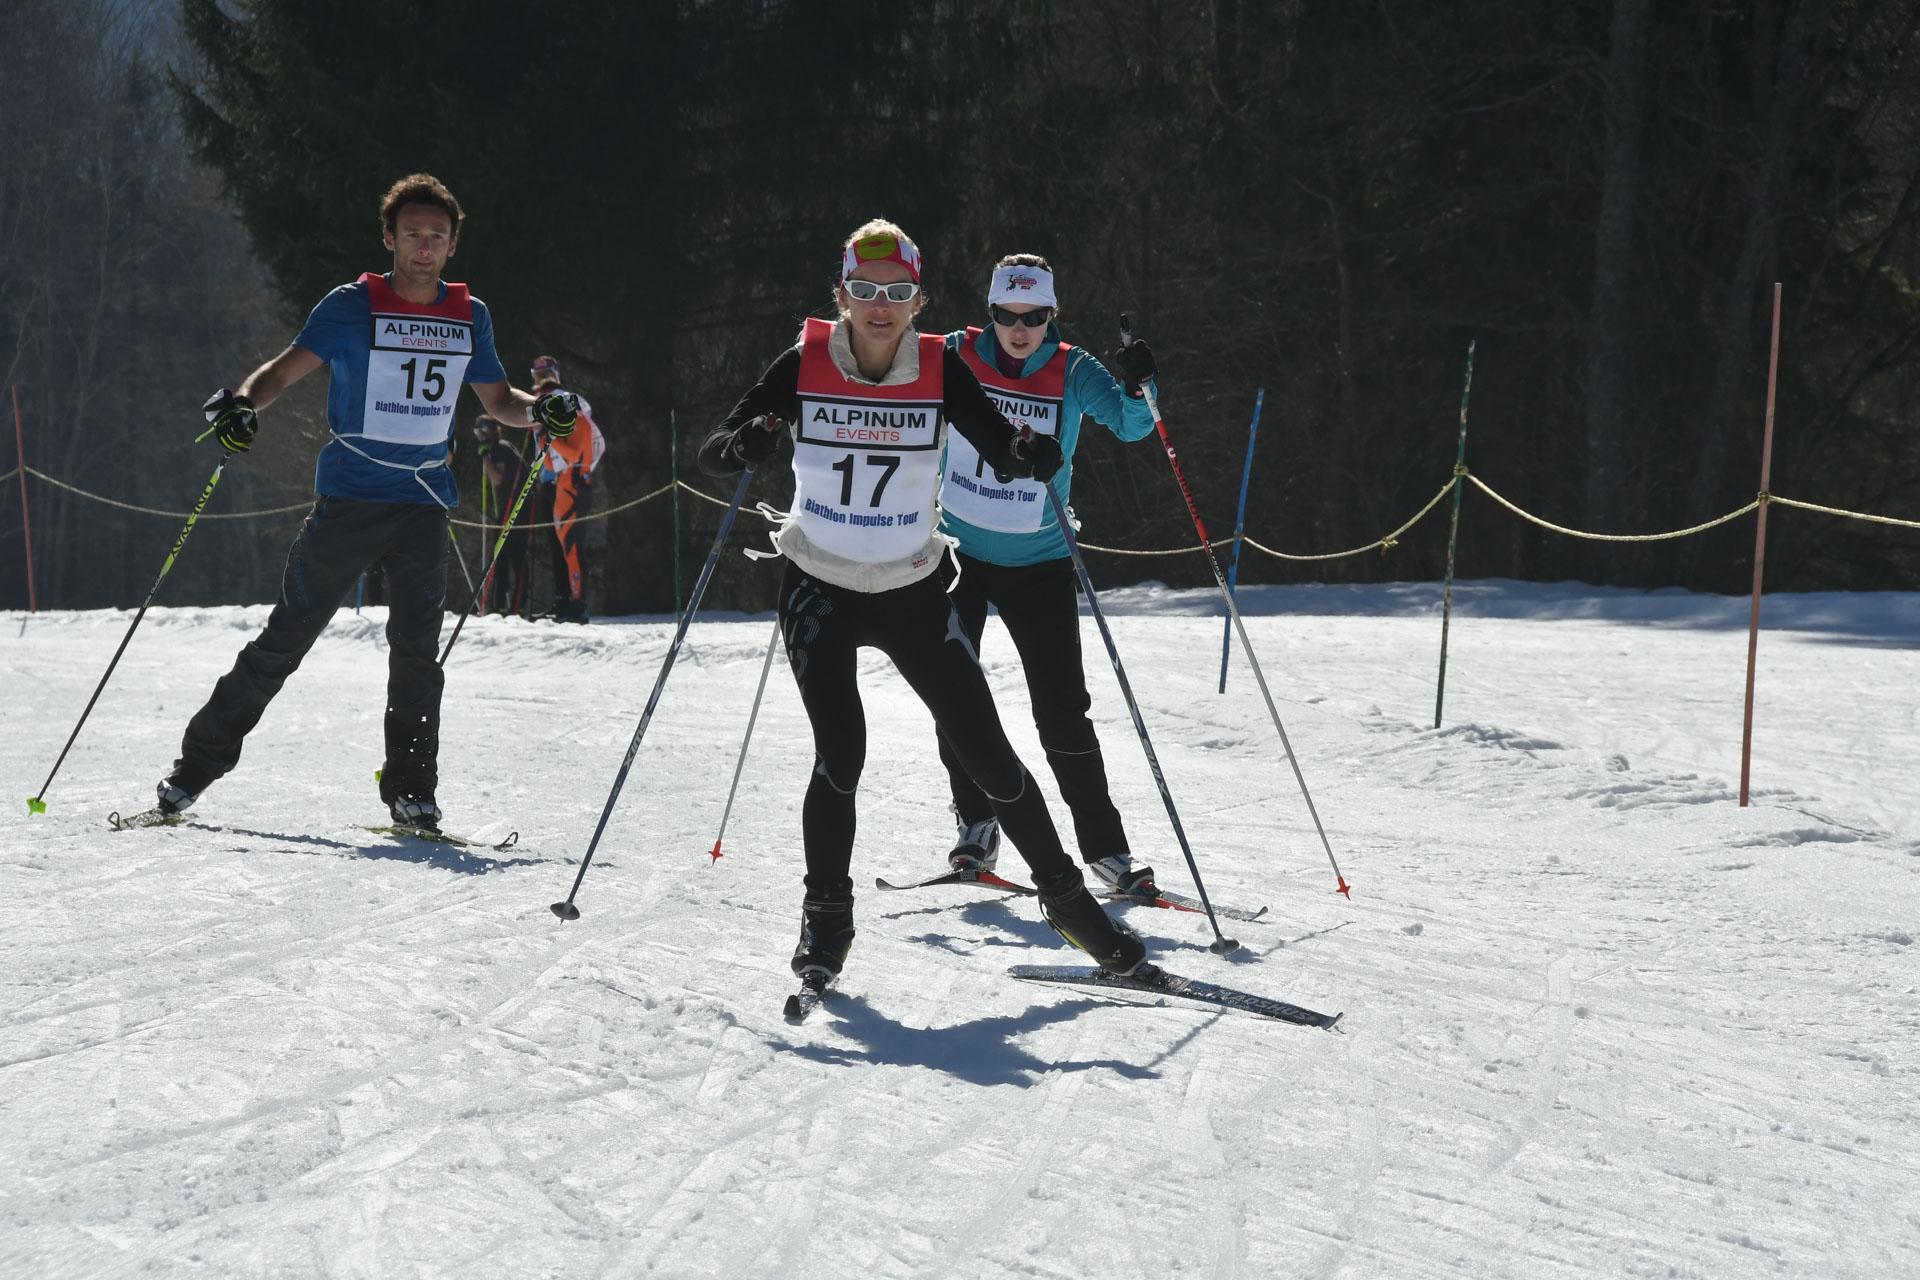 Alpinum-Biathlon-Impulse-Tour-2019©JulieRuly_202